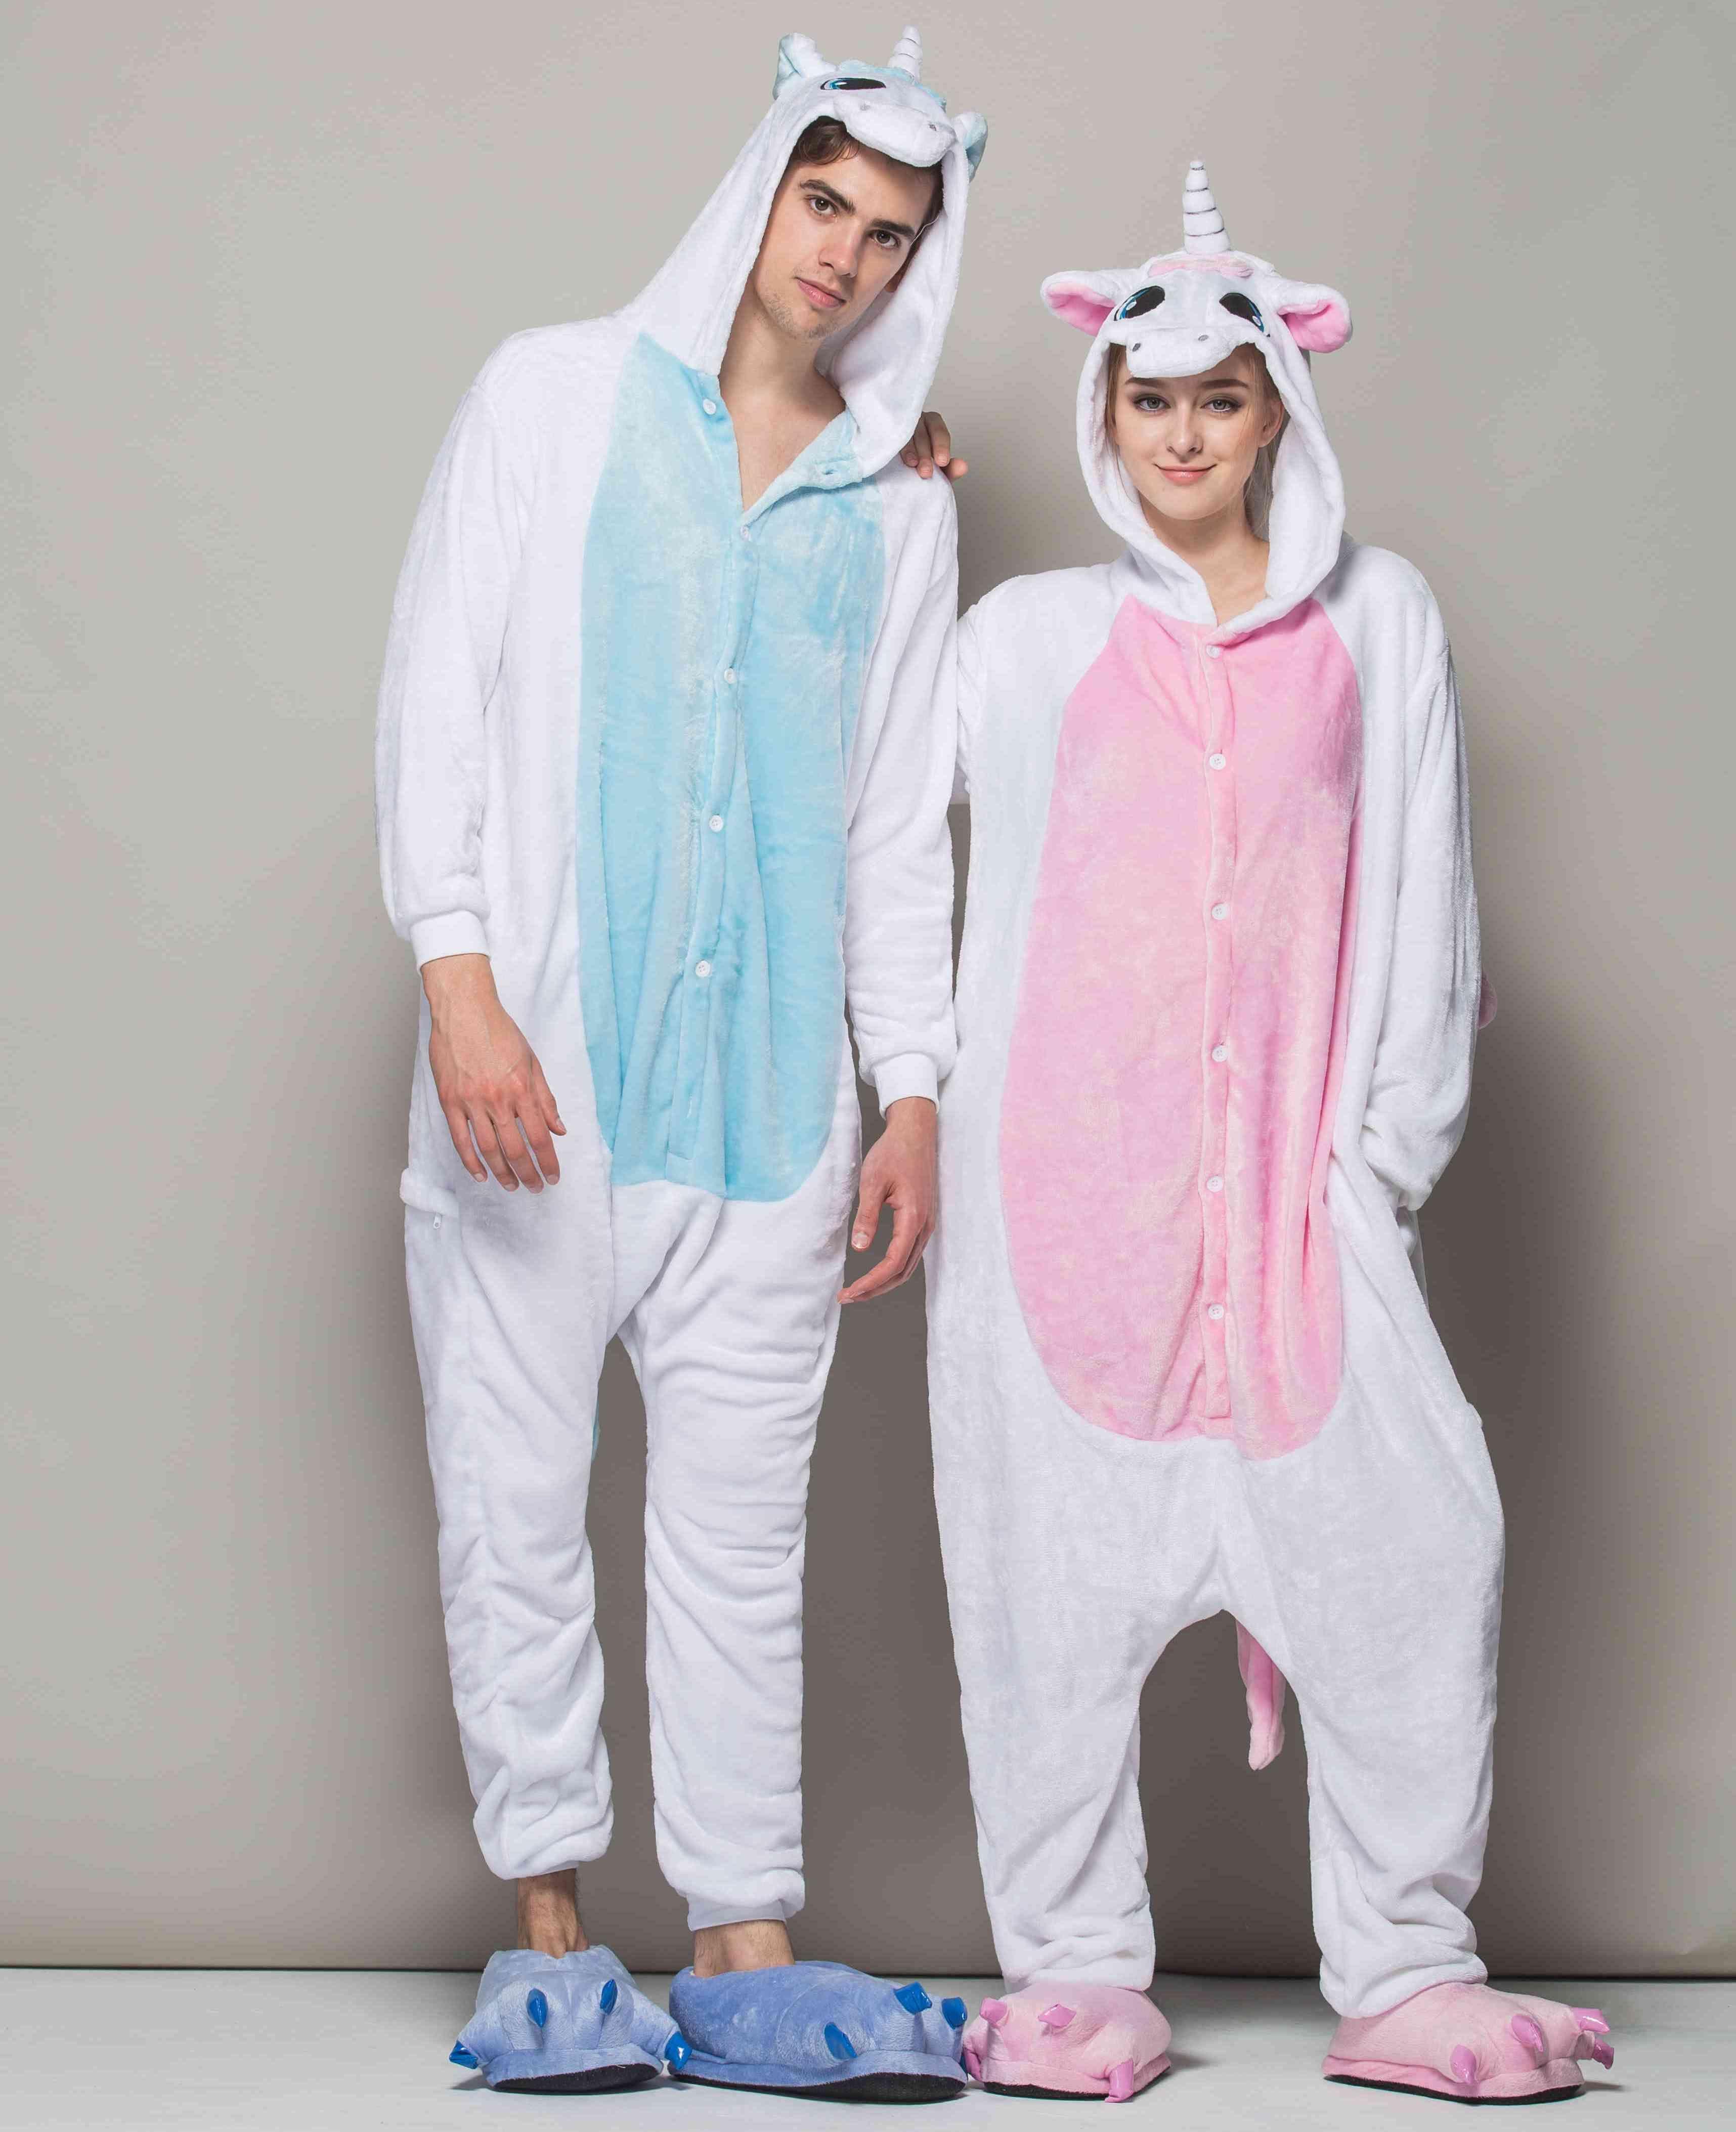 Cartoon Sleep clothes pajama sets Adults women Unicorn flannel Onesies caroset sleepwear Loungewear animal pajamas for adult HML-003